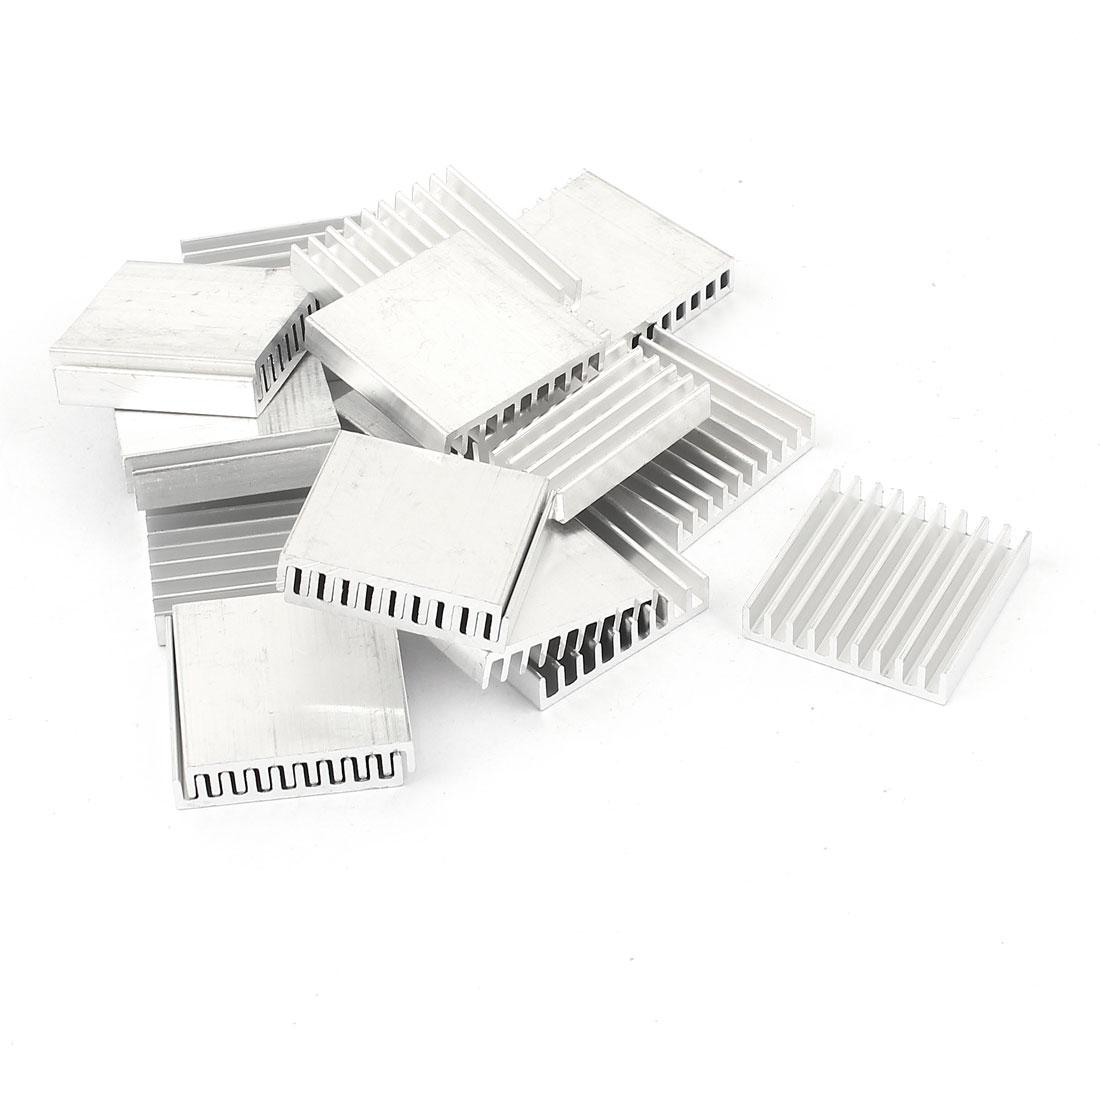 20 Pcs Aluminum Heatsinks Radiator Cooling Fin Cooler 28mmx28mmx6mm Silver Tone